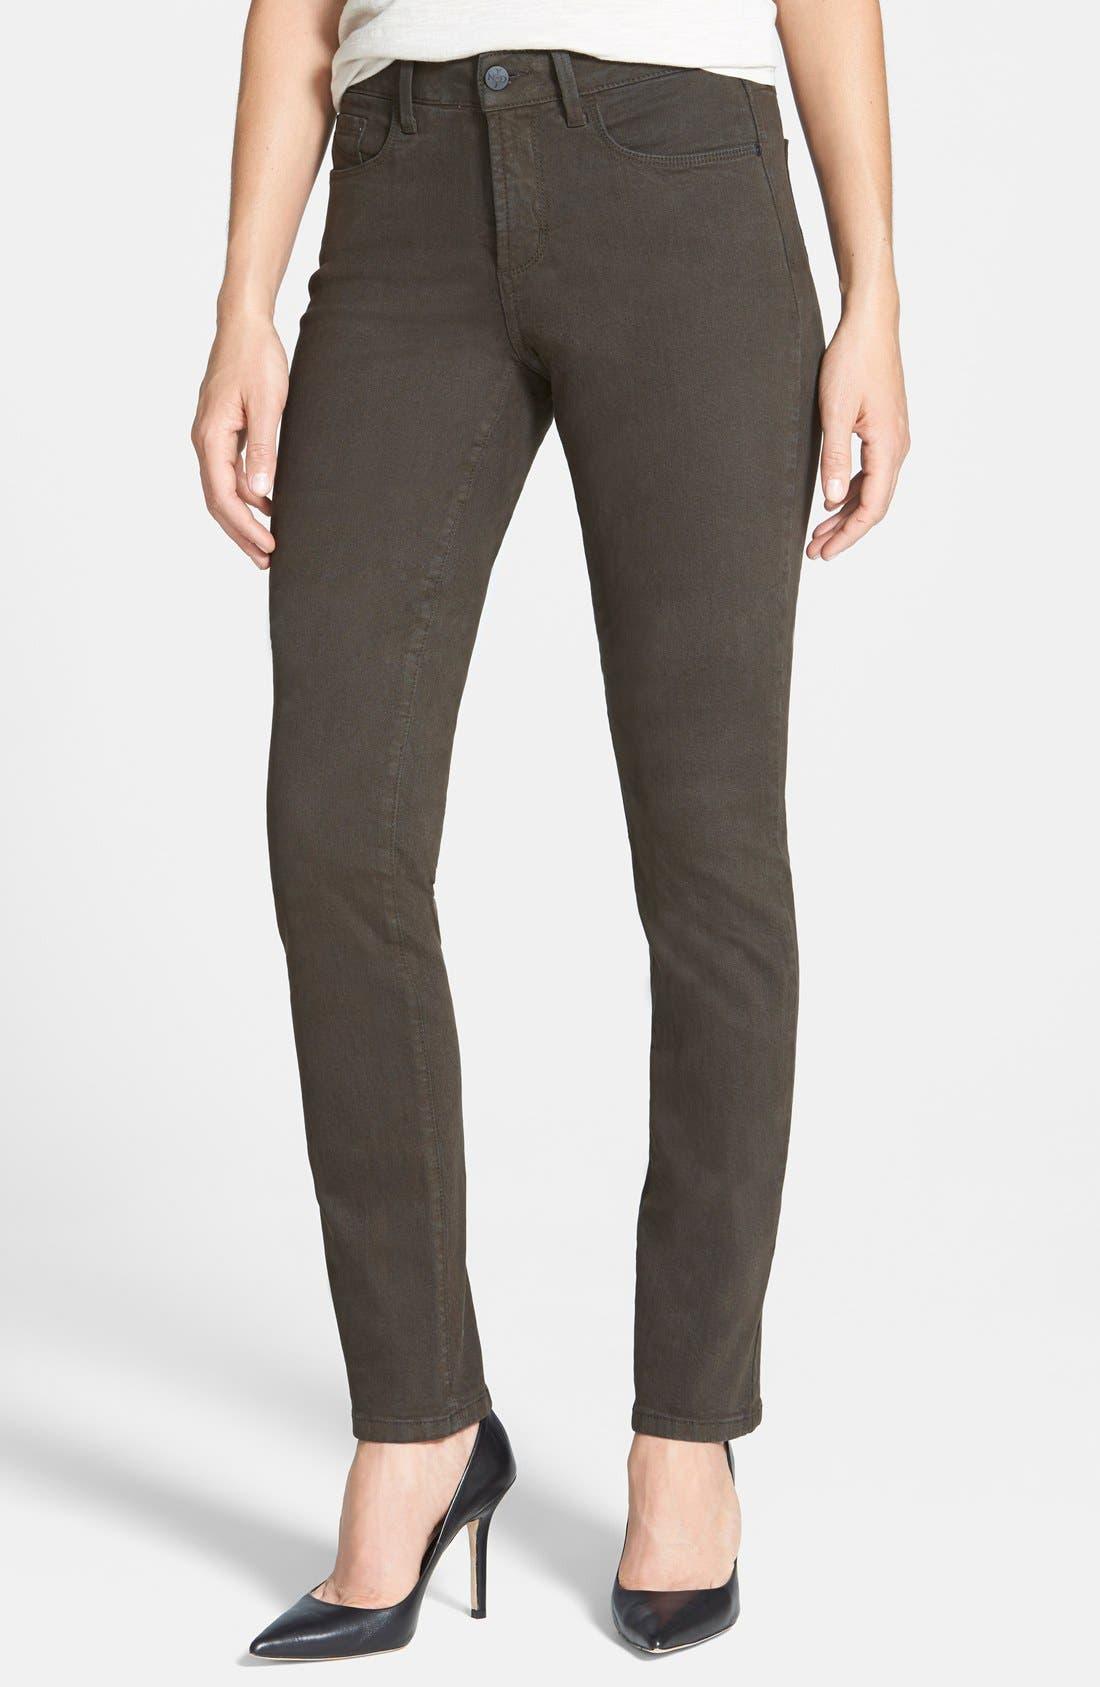 Alternate Image 1 Selected - NYDJ Sheri Colored Stretch Skinny Jeans (Petite)